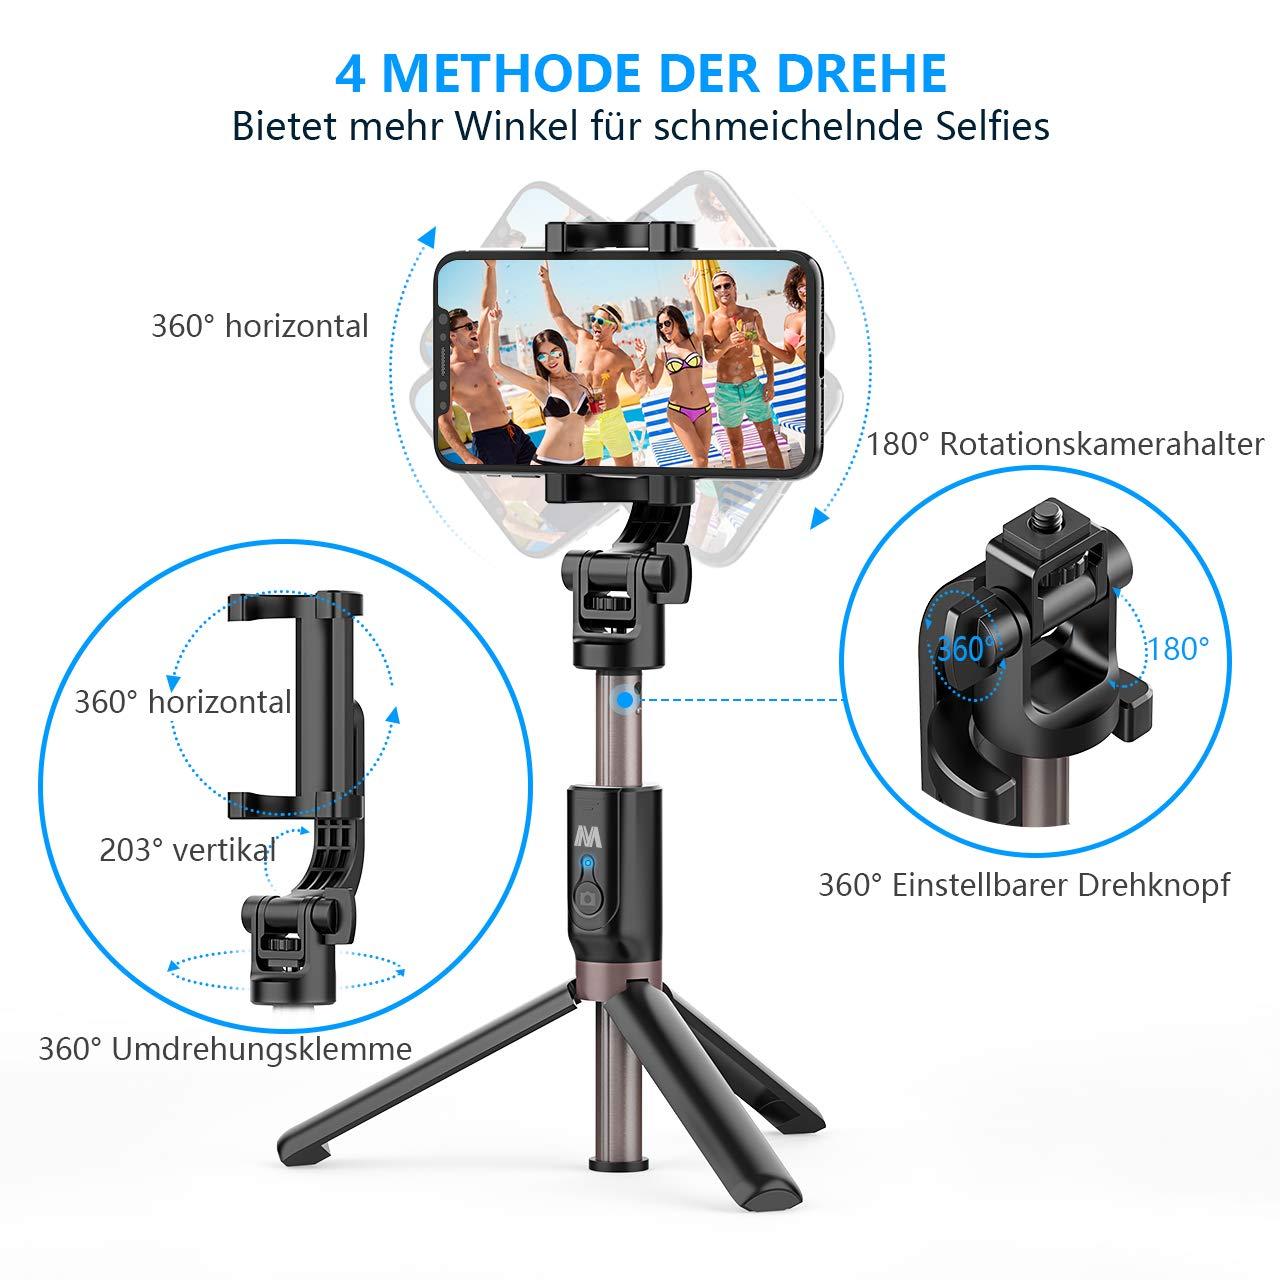 Selfiestick Stativ Bluetooth Wireless Mini Selfie Stange Stab mit Abnehmbarer Bluetooth Fernbedienung 4 in 1 360/° Rotation f/ür alle Bluetooth-f/ähige Smartphones und Kamera GoPro Romanda Selfie Stick